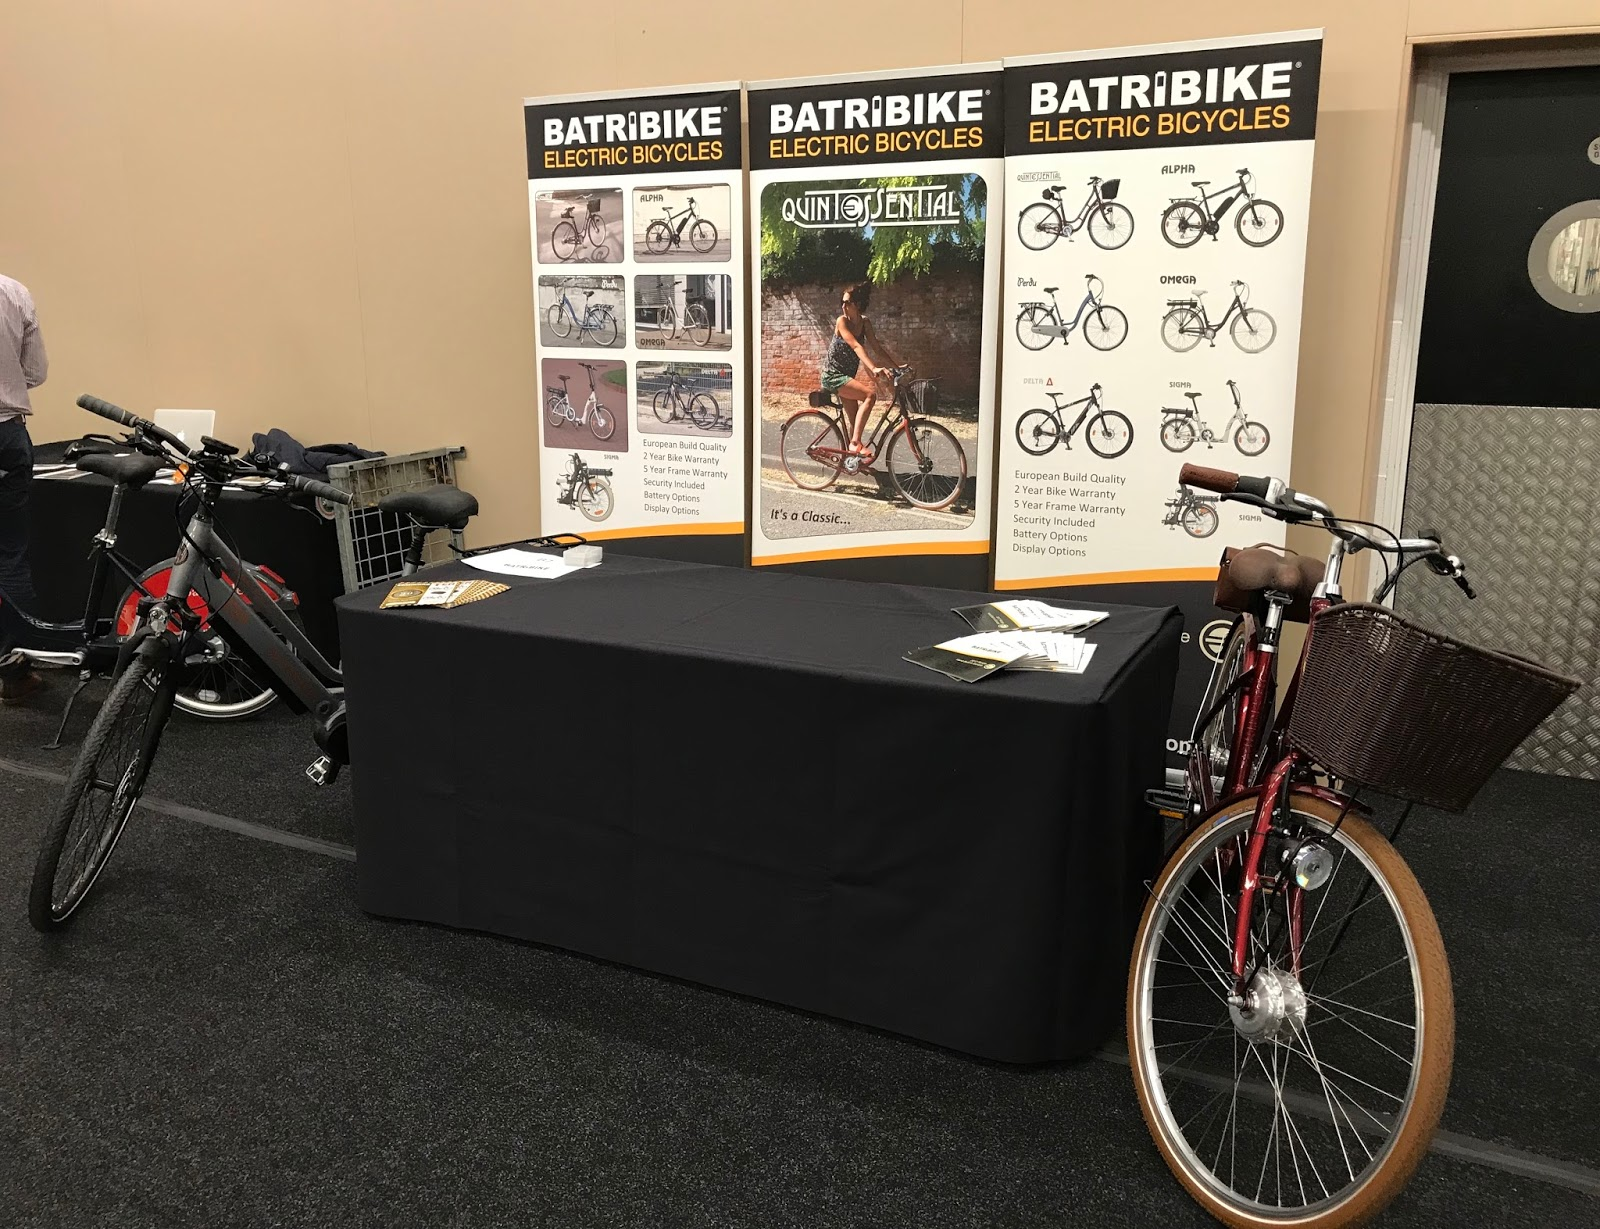 Batribike electric bicycles: November 2017